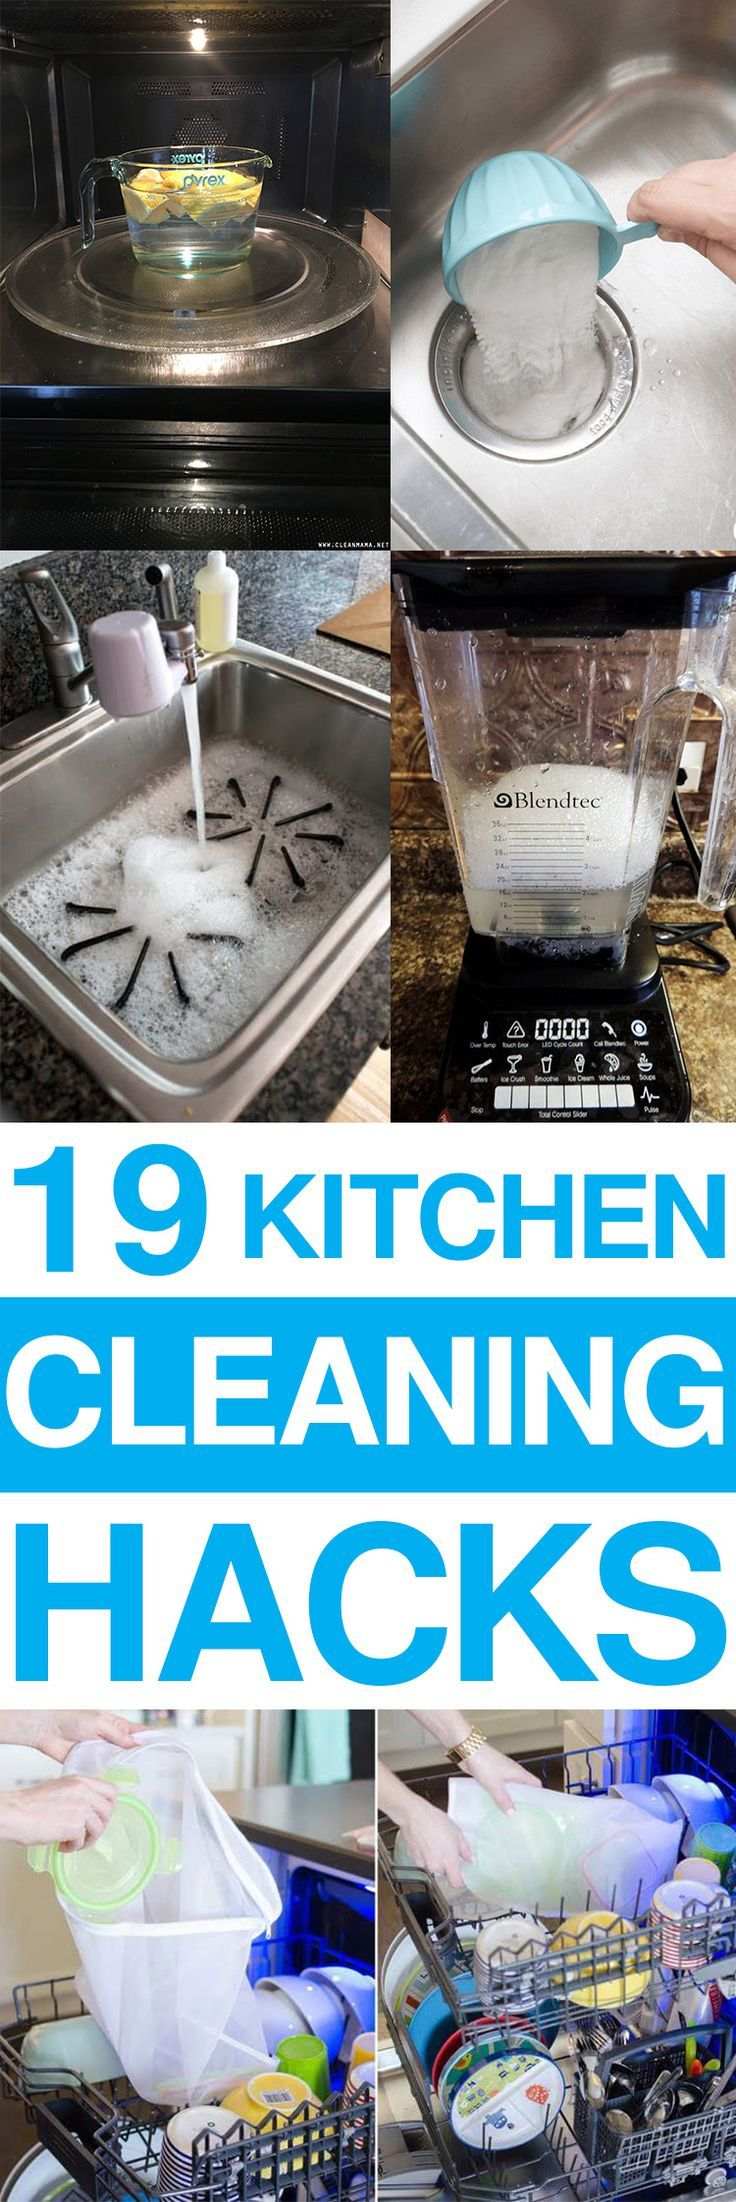 19 Genius Kitchen Cleaning Hacks That Will Make Your Kitchen ...